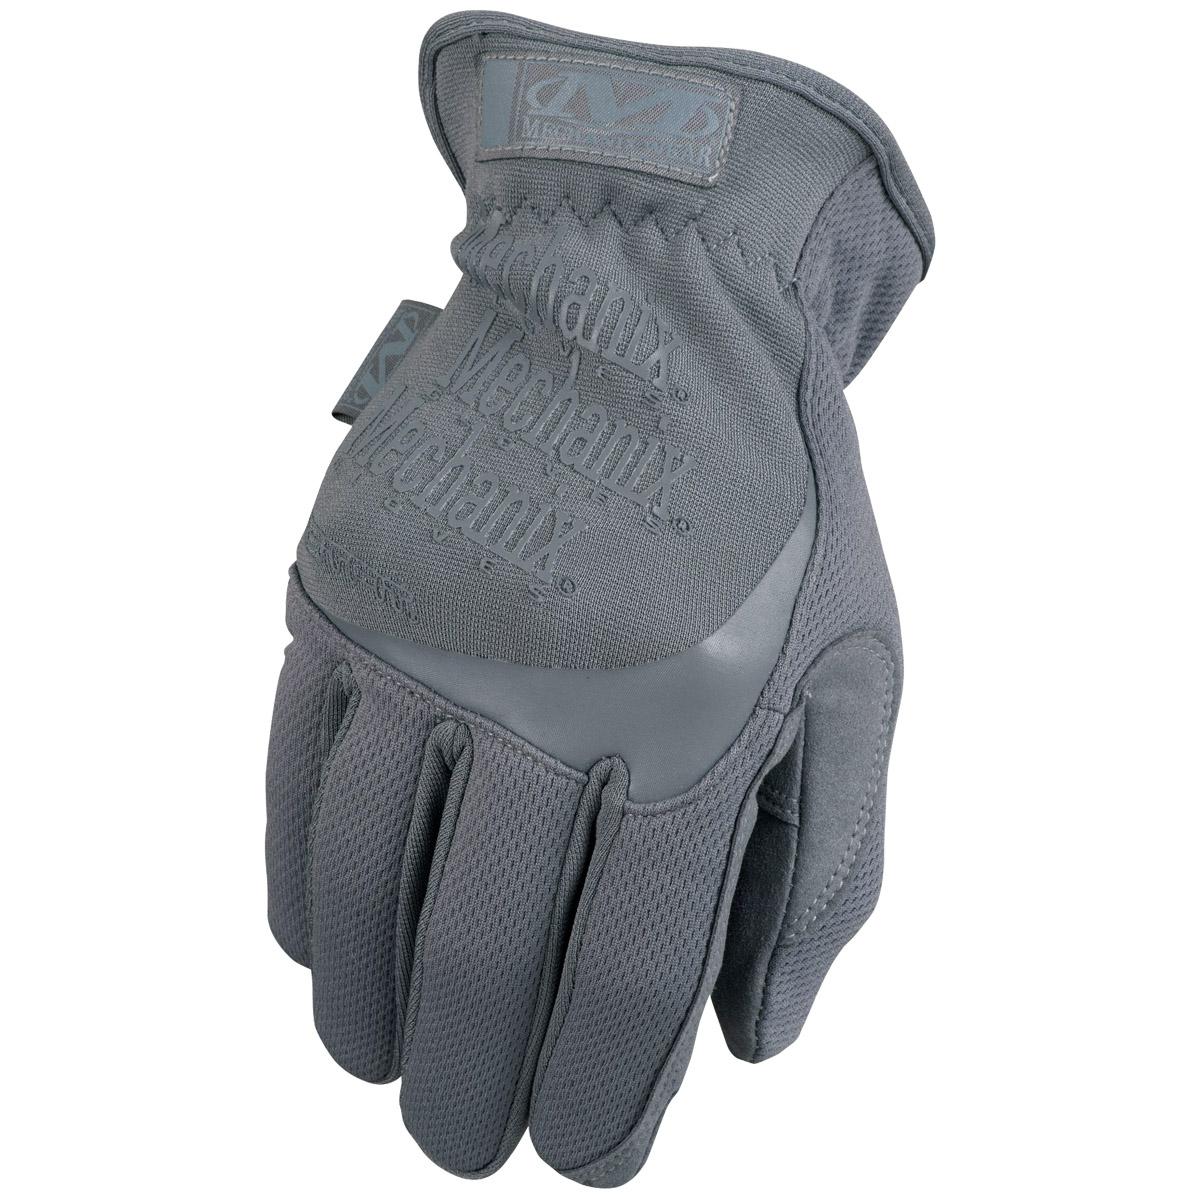 Male gloves ebay - Mechanix Wear Fastfit Tactical Operator Combat Mens Gloves